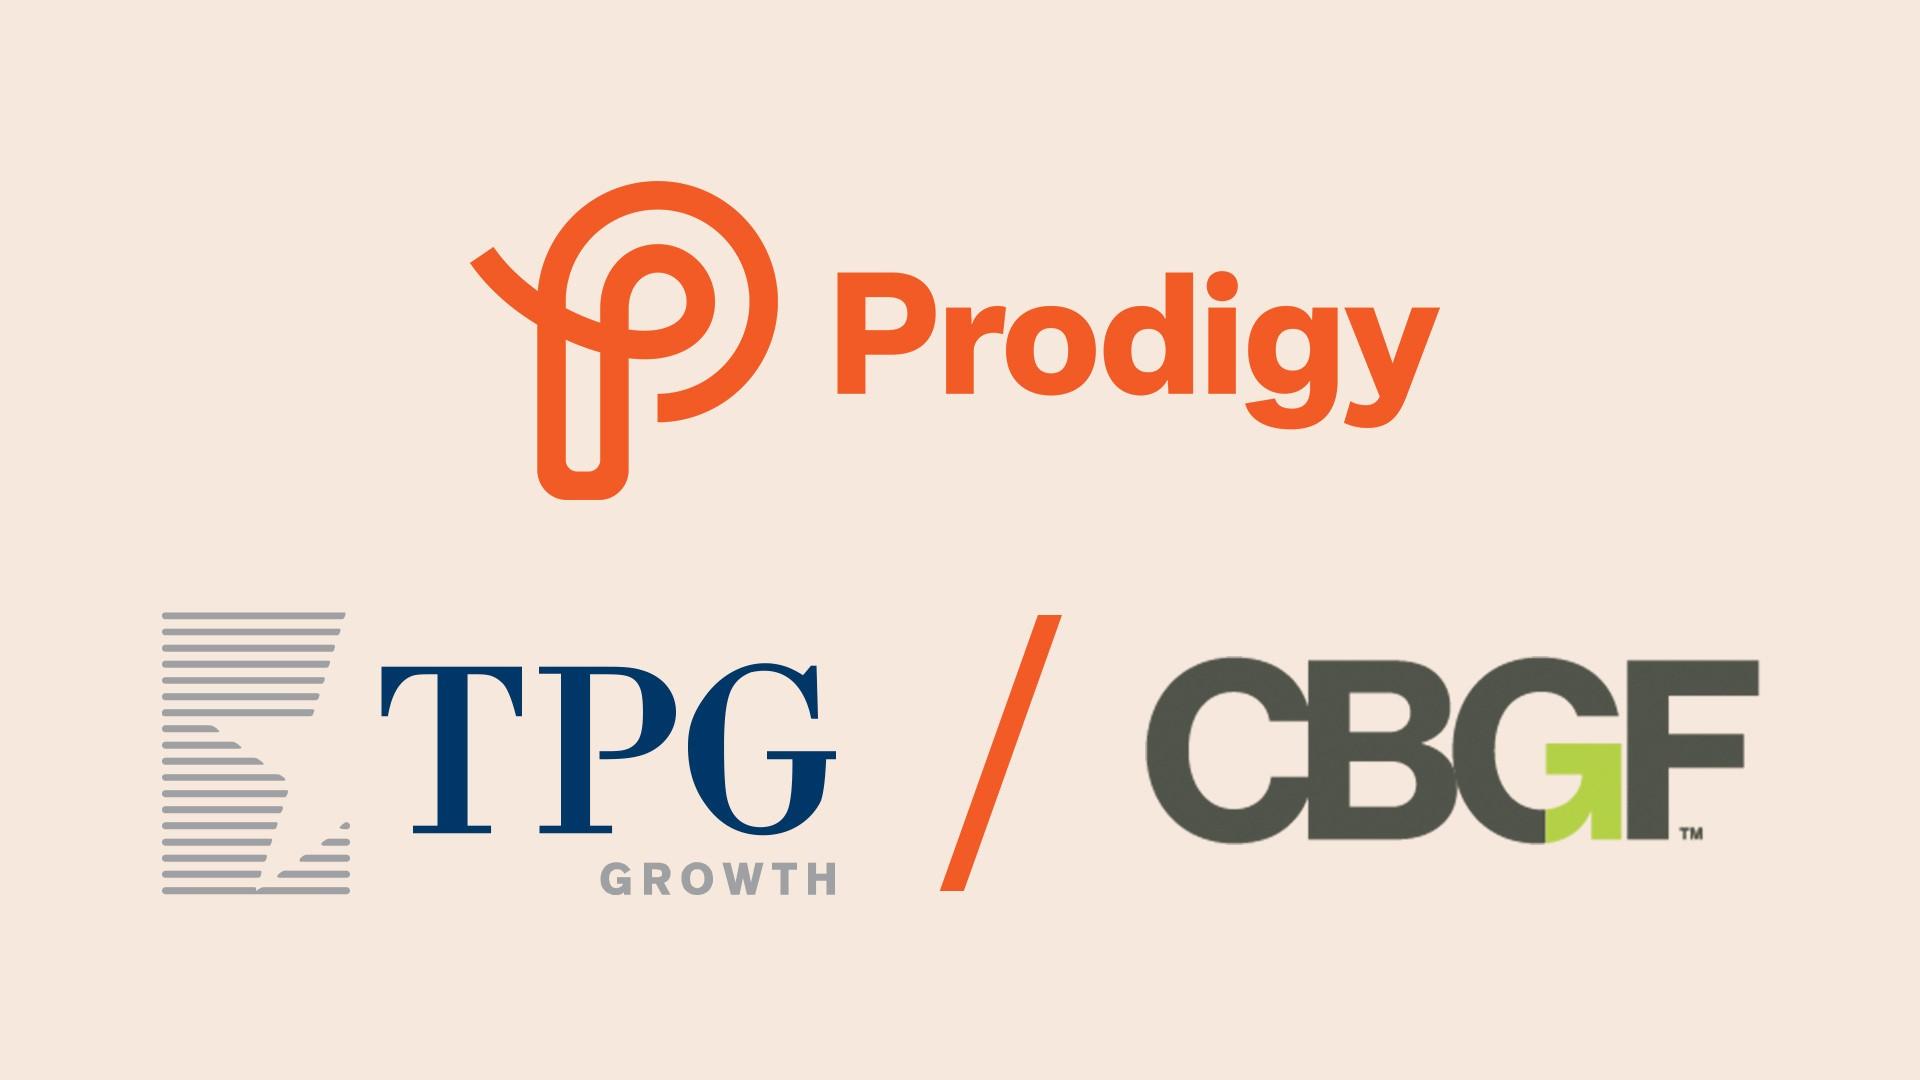 Prodigy, TPG Growth and CBGF logos.